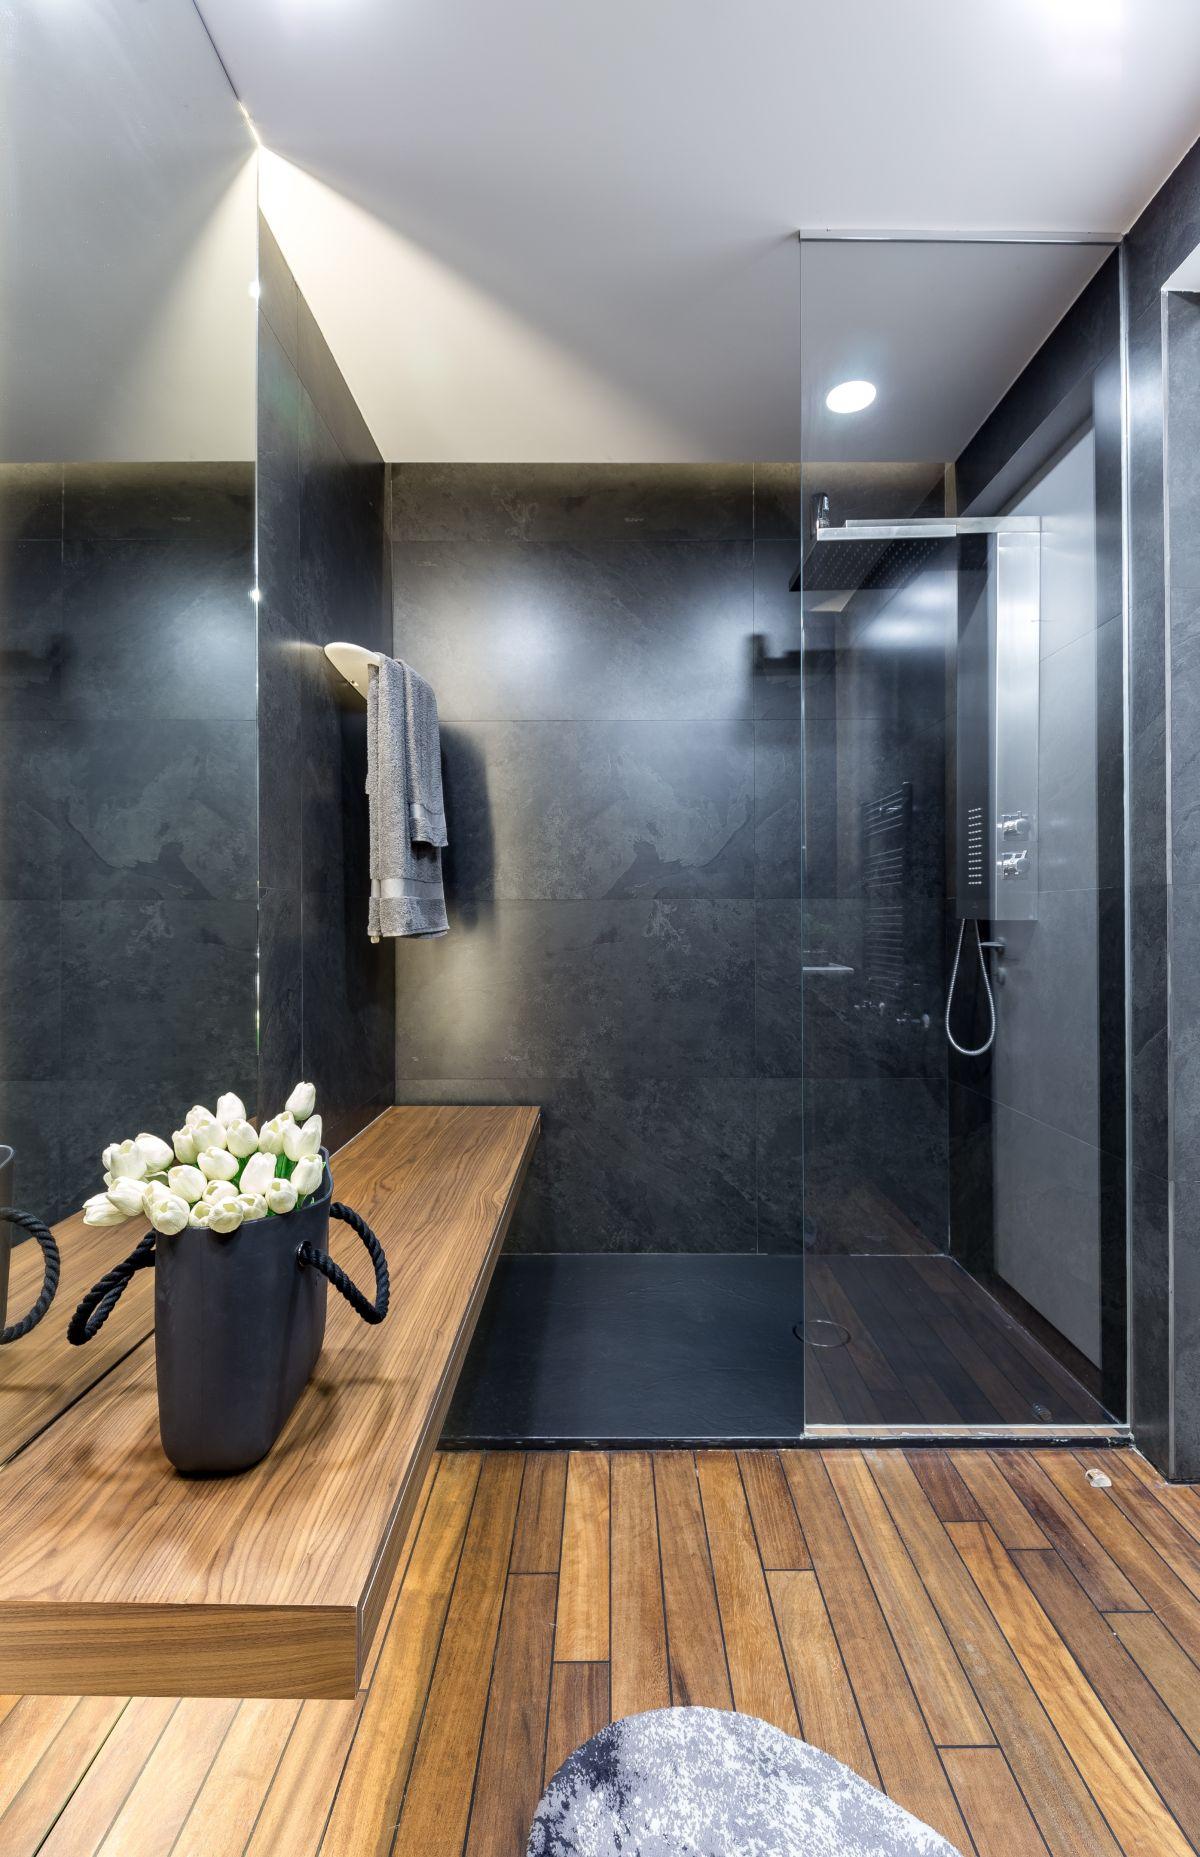 The wood floor gives the bathroom a sauna-like feeling.